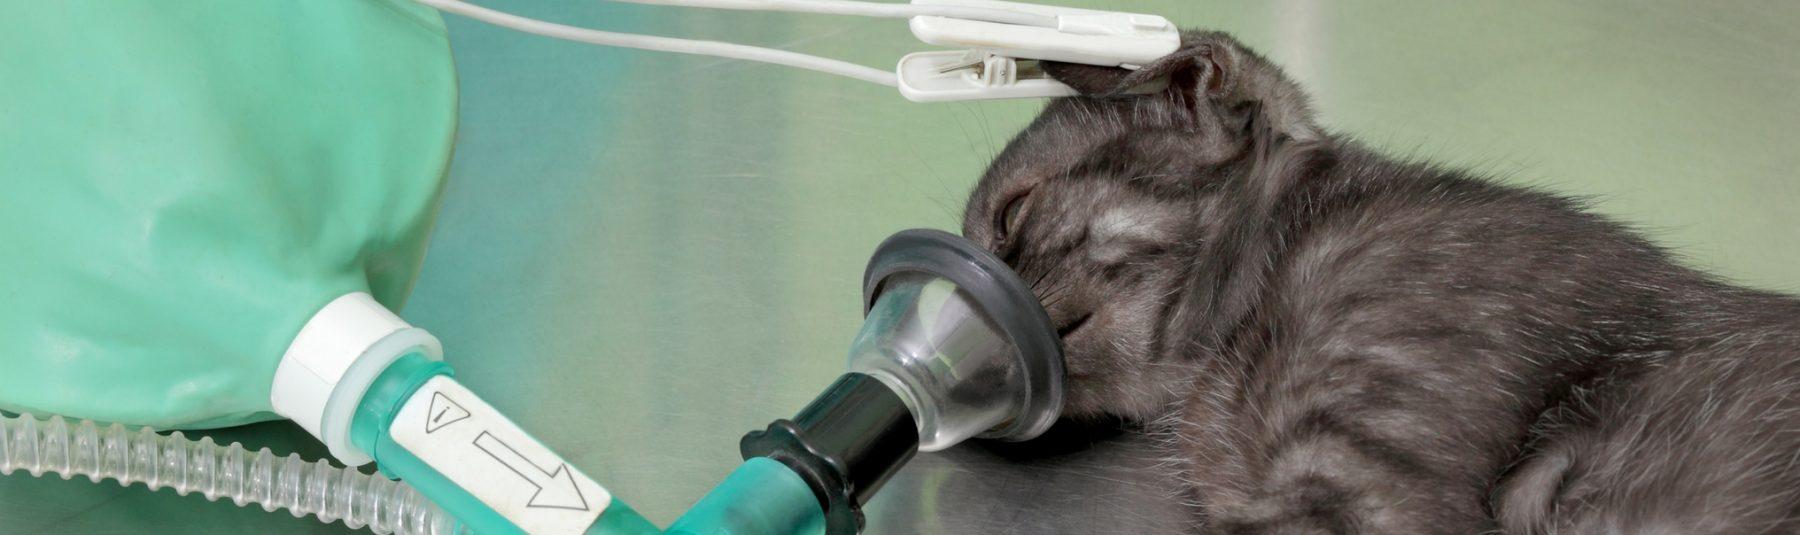 cat-surgery-service